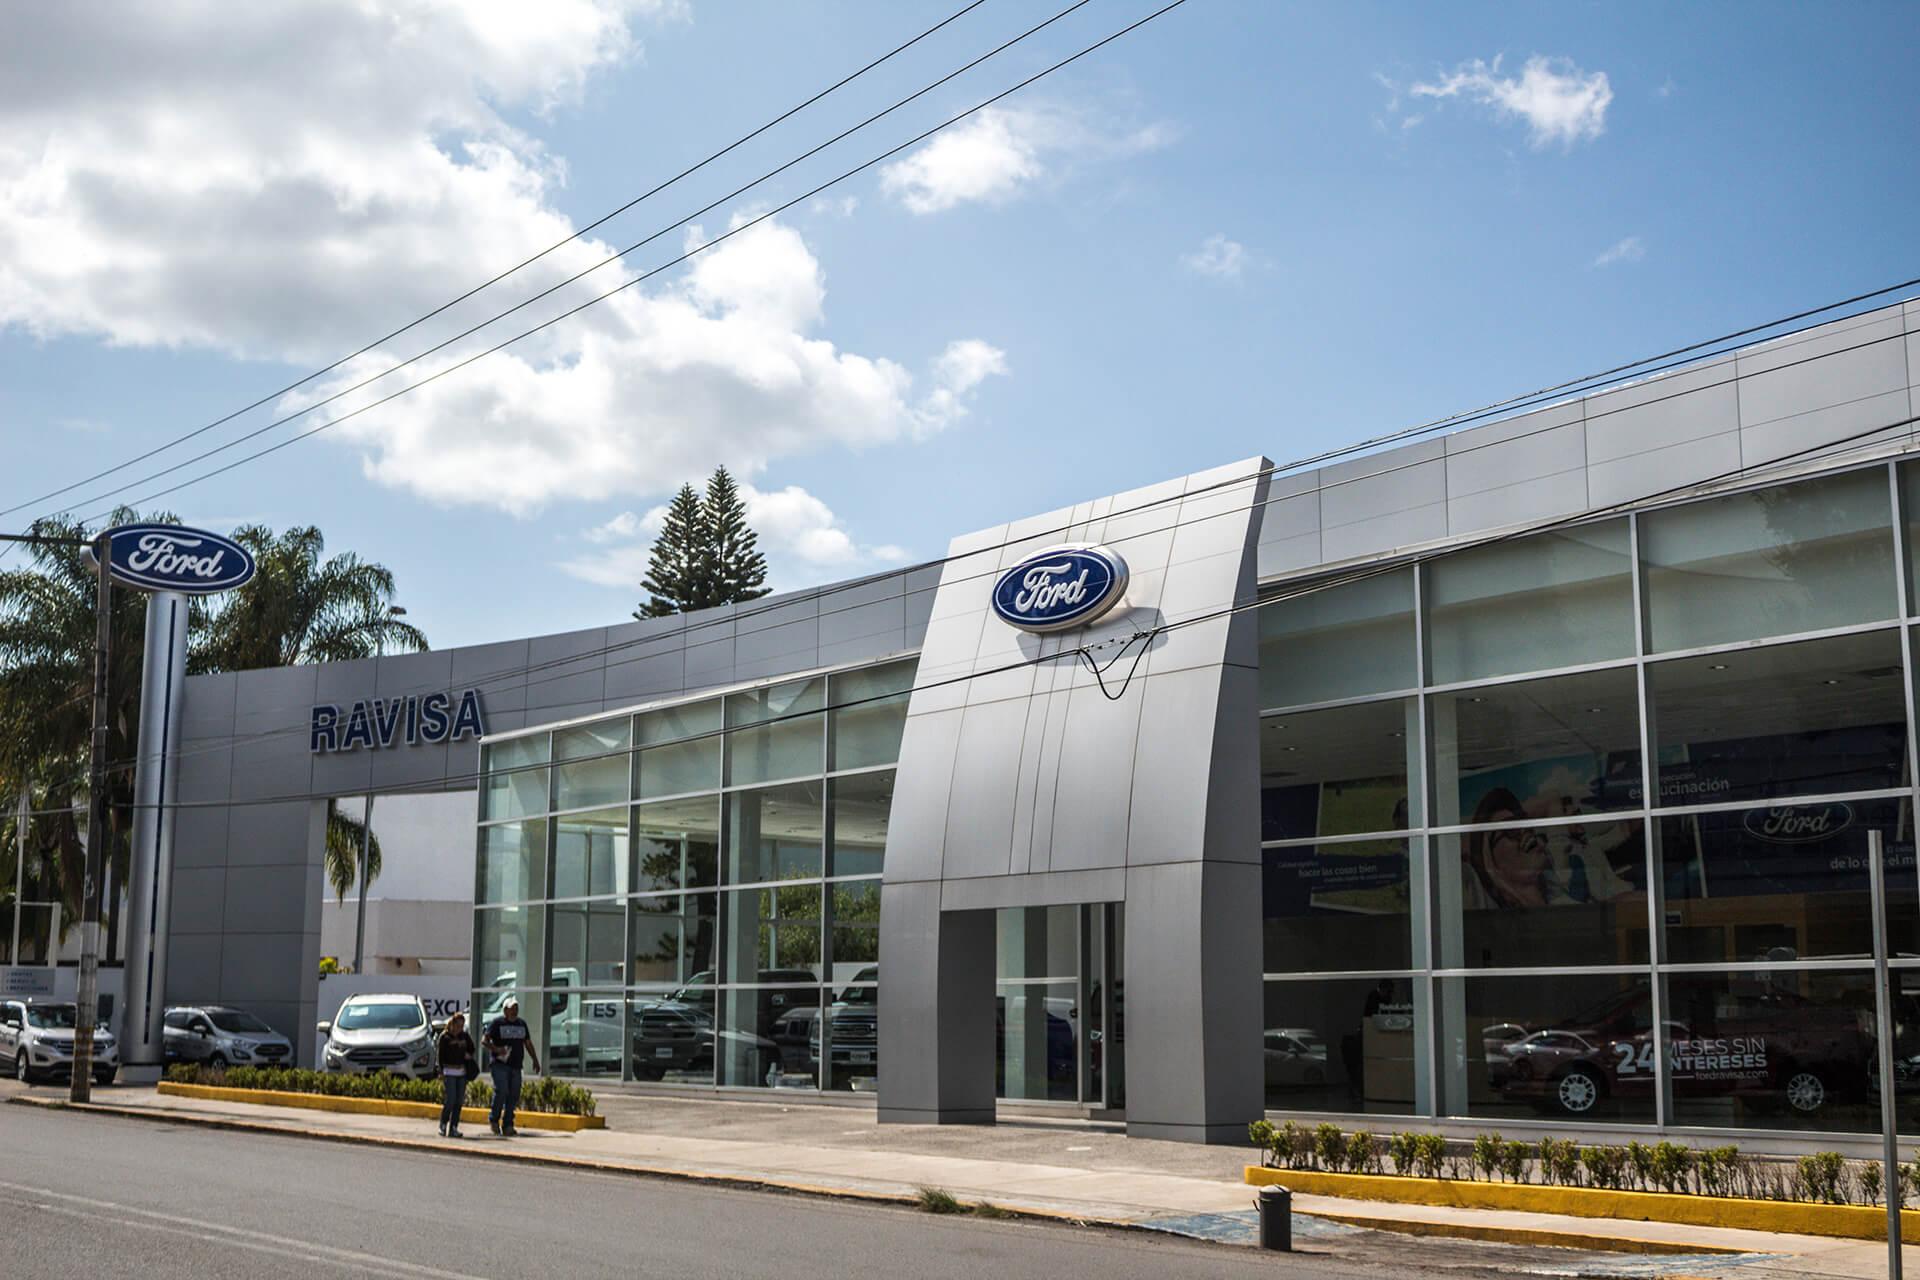 Ford Ravisa Las Américas - Imagen 2